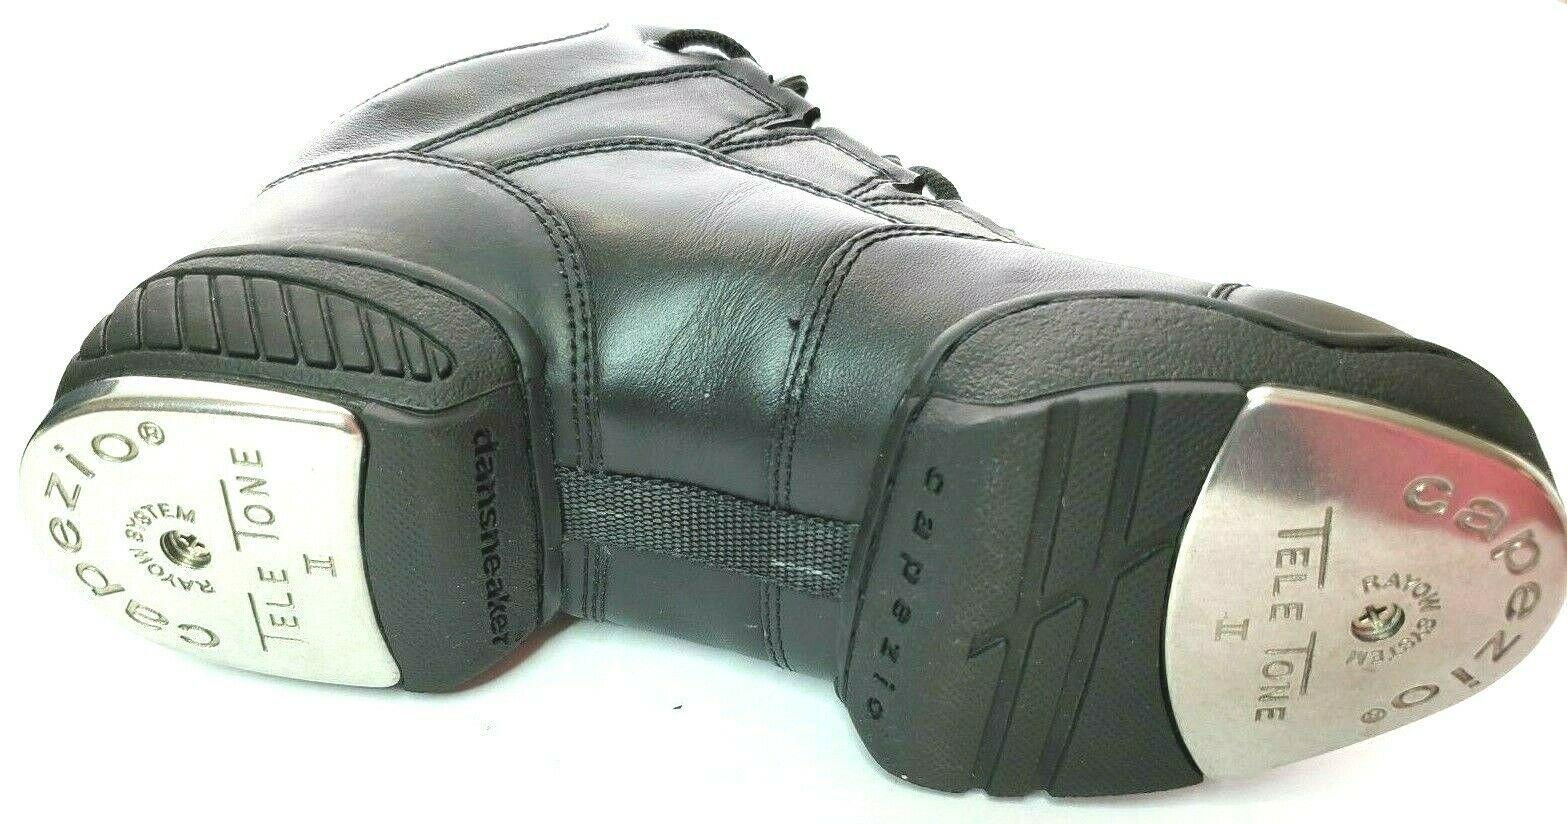 Capezio Dansneaker Womens Size 6 M Tele Tone II Tap Shoes Black Lace Up  Dri Lex